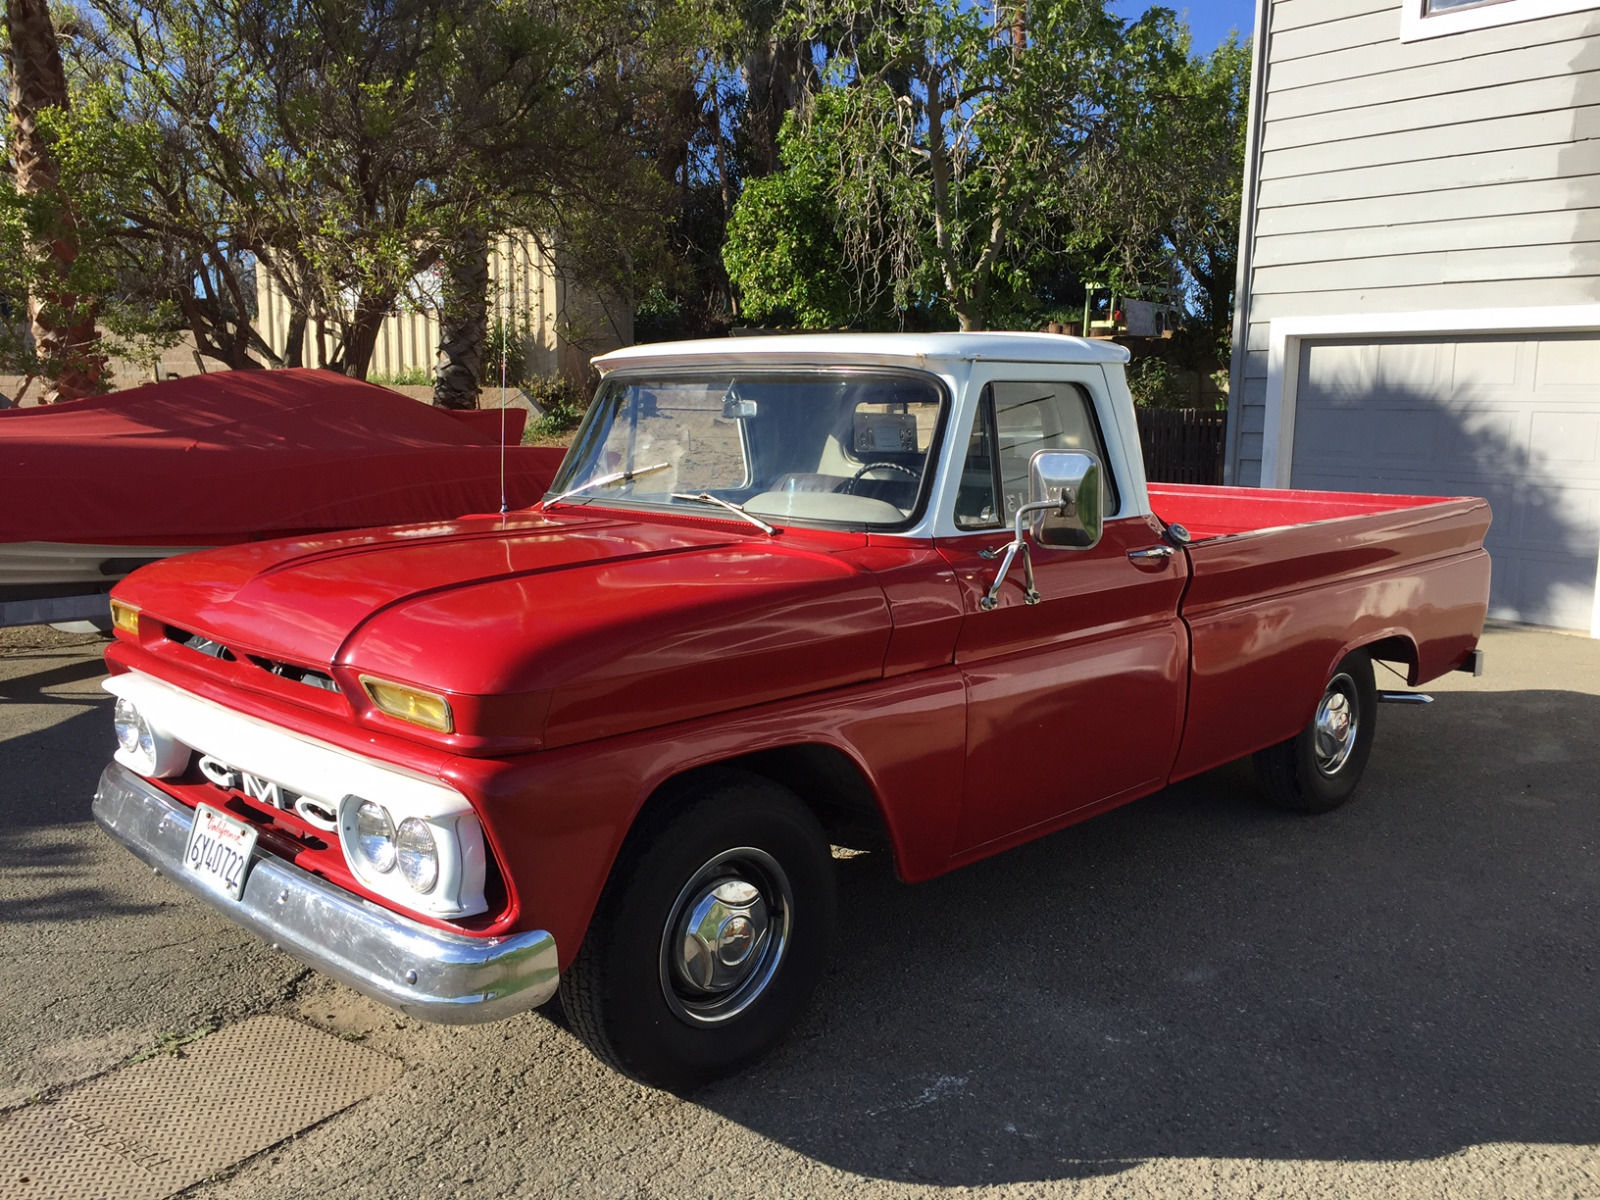 1965 gmc series 1000 c10 longbed truck for sale. Black Bedroom Furniture Sets. Home Design Ideas